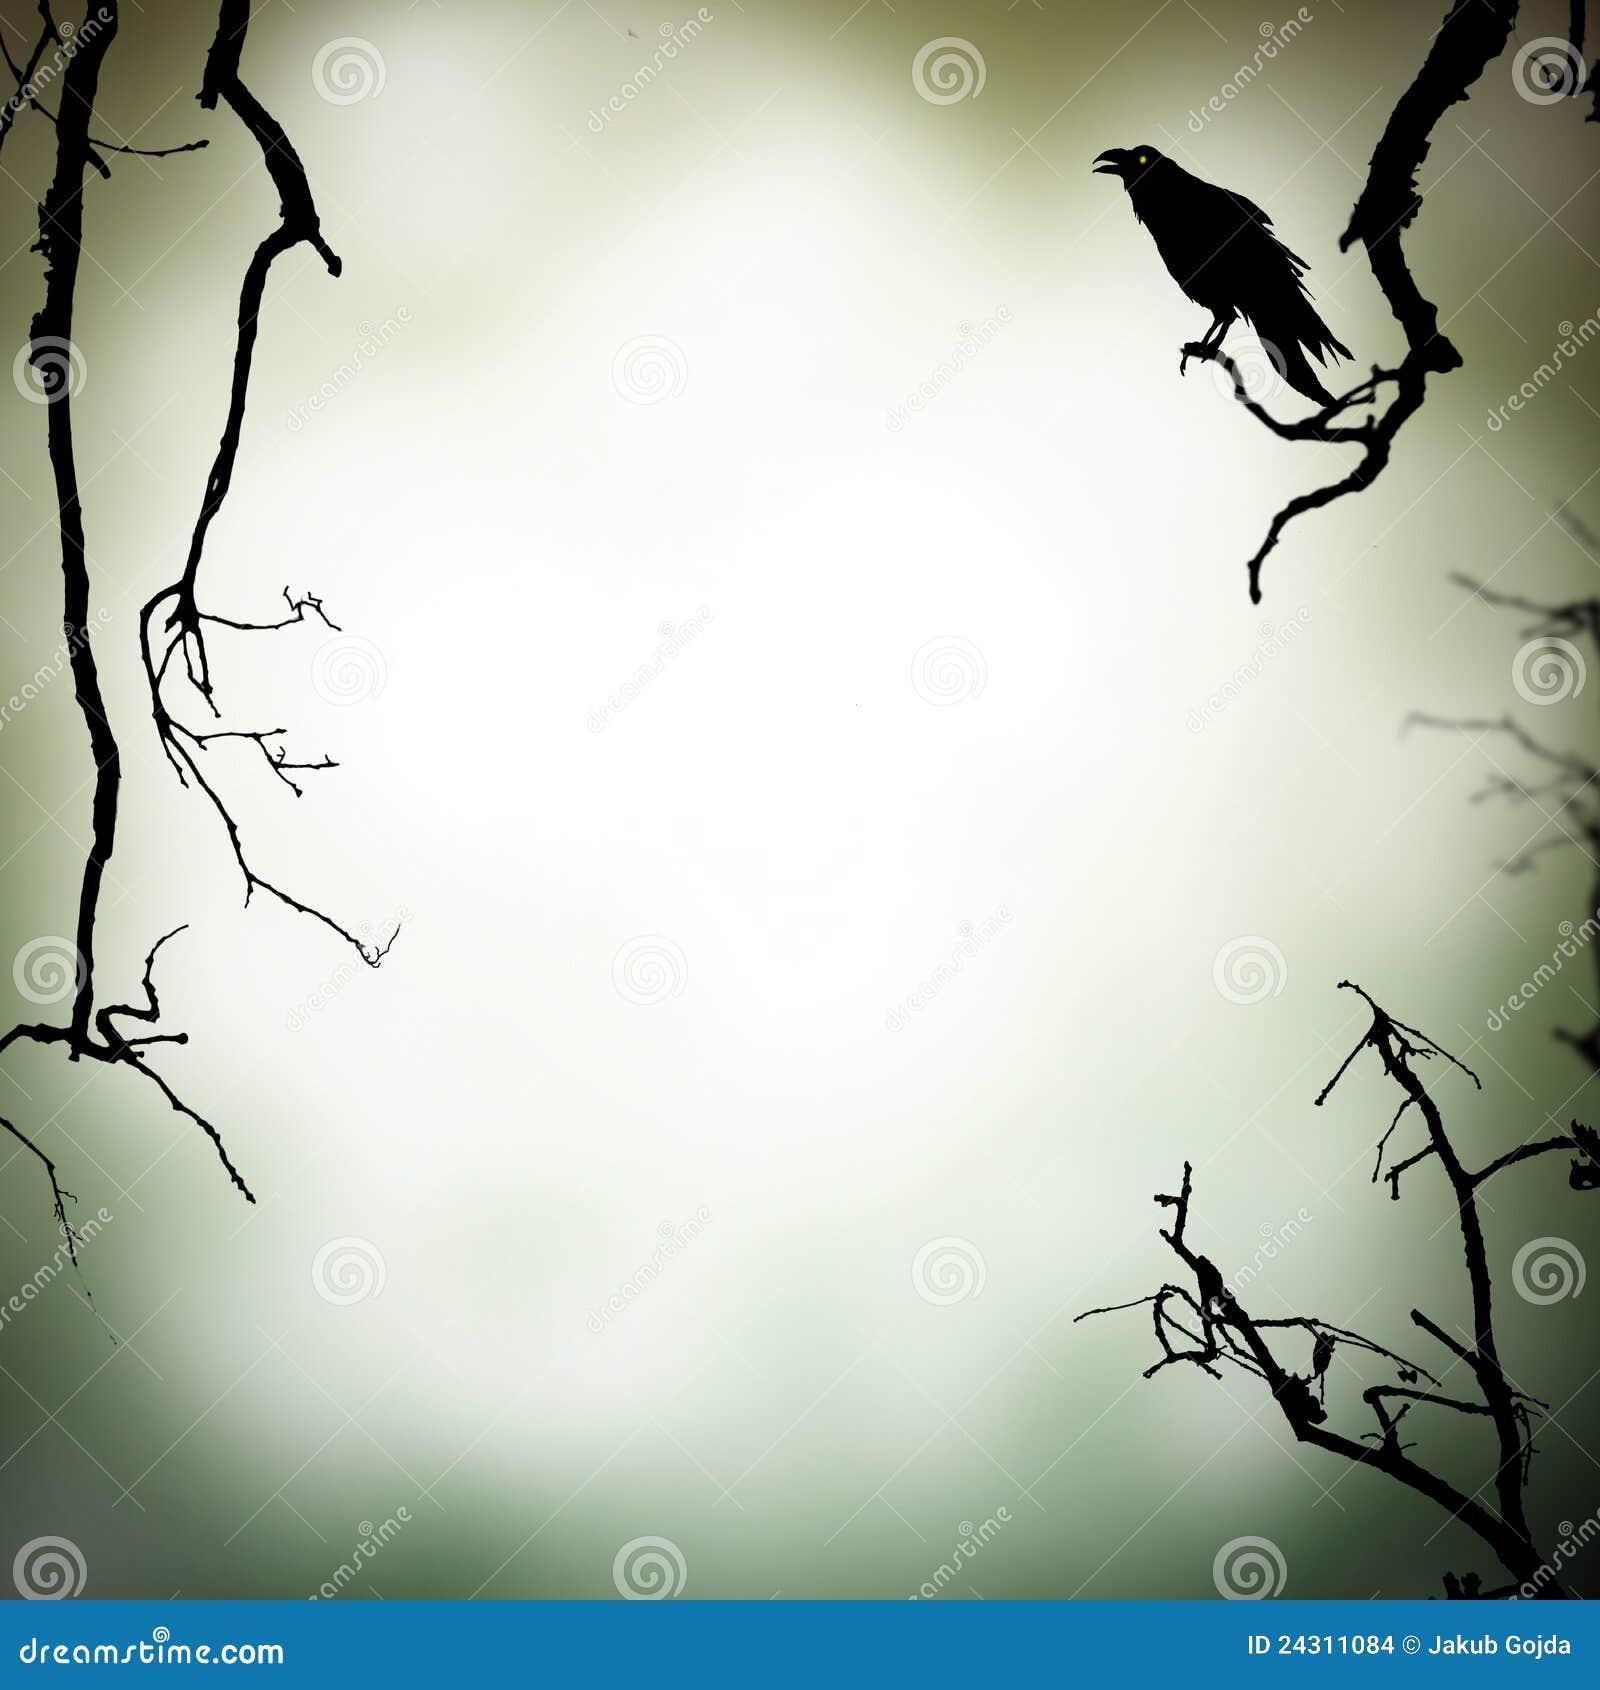 horror background stock images image 24311084 halloween bats clip art free halloween bat clip art images